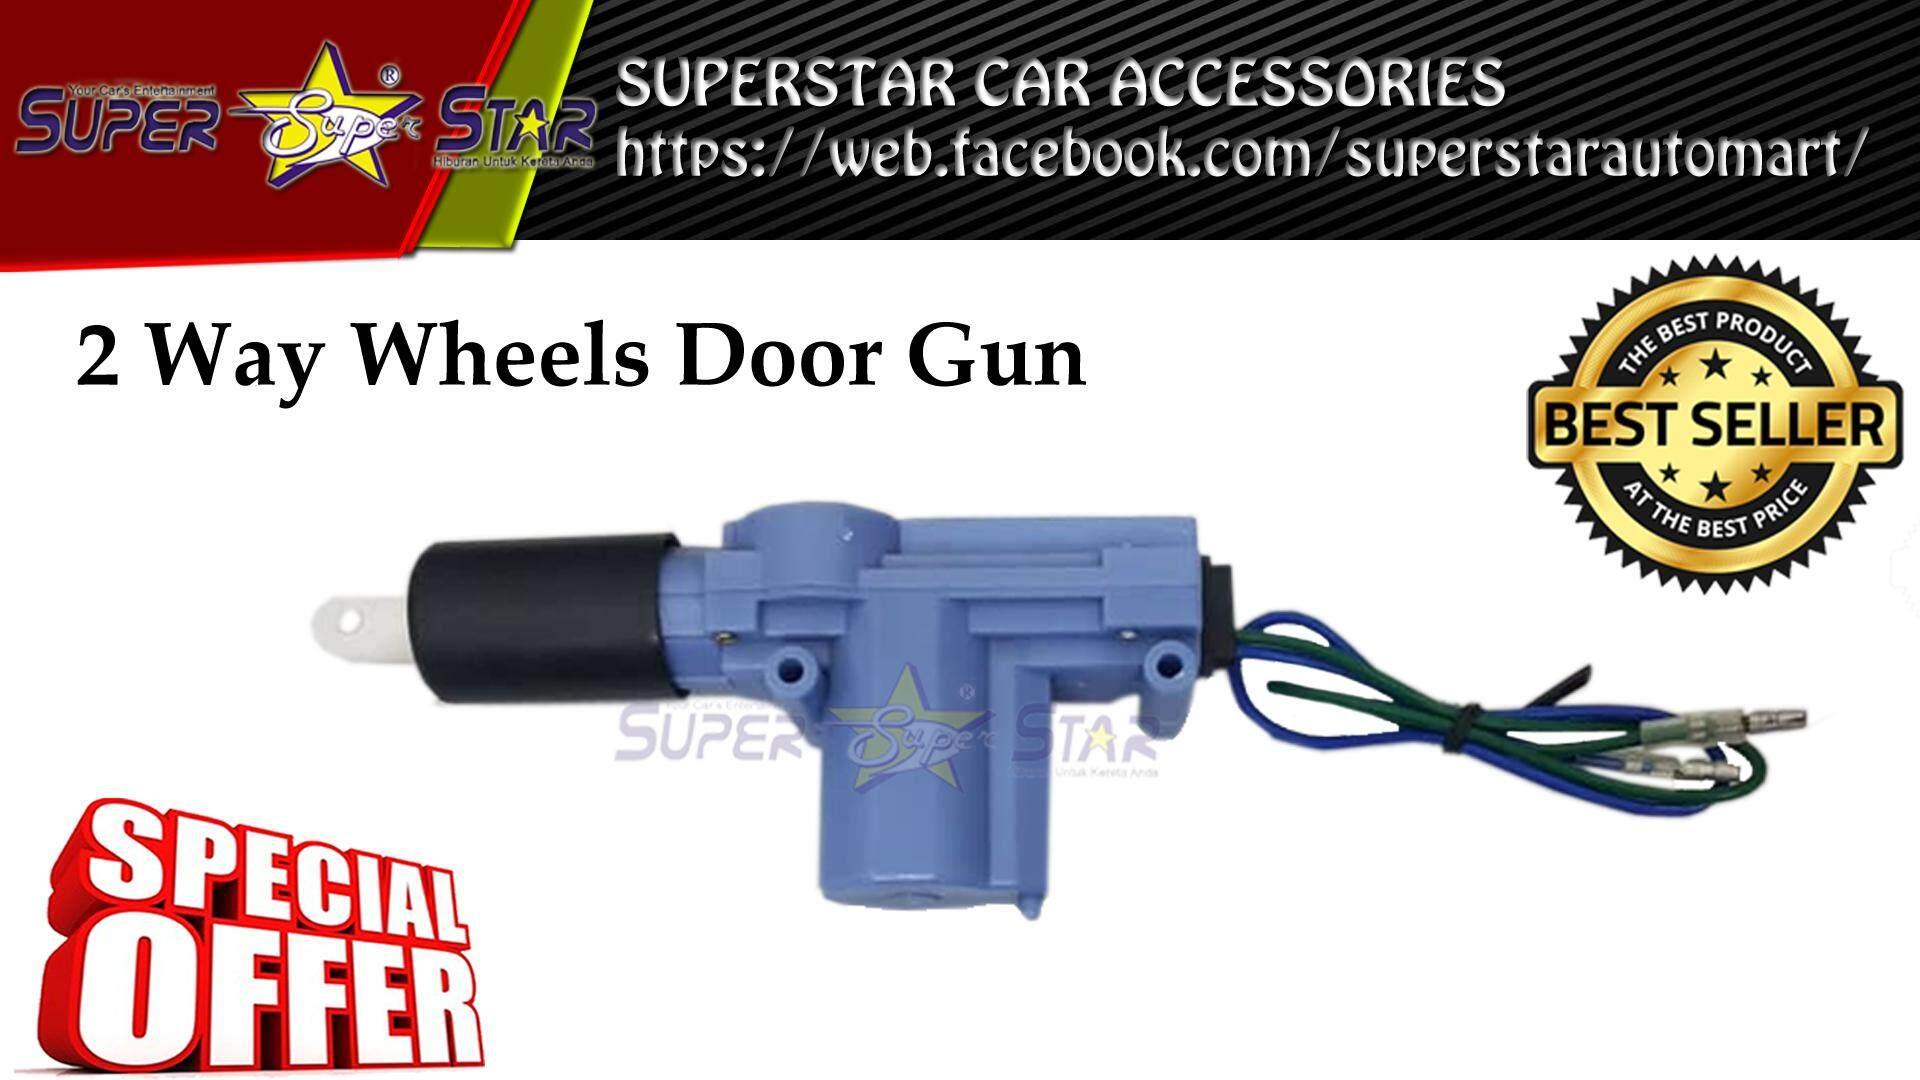 Superstar Car Accessories New Arrival Pixy Plus Viva 2 Way Wheels Door Gun Actuator Central Lock For Proton Wira Saga Perodua Myvi Replacement